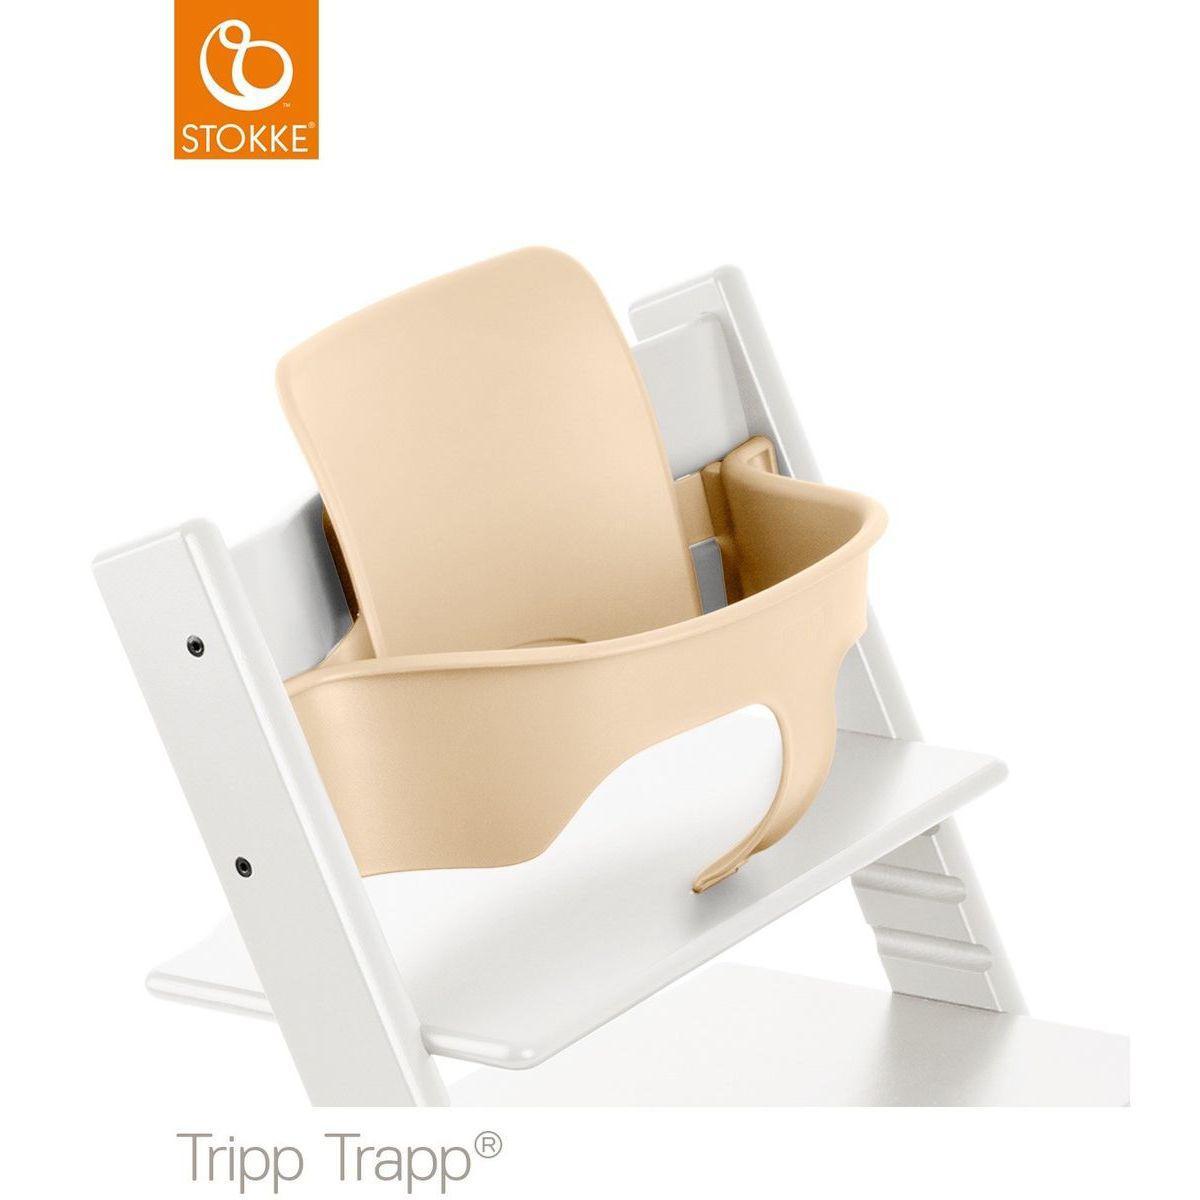 Baby set chaise haute TRIPP TRAPP Stokke naturel